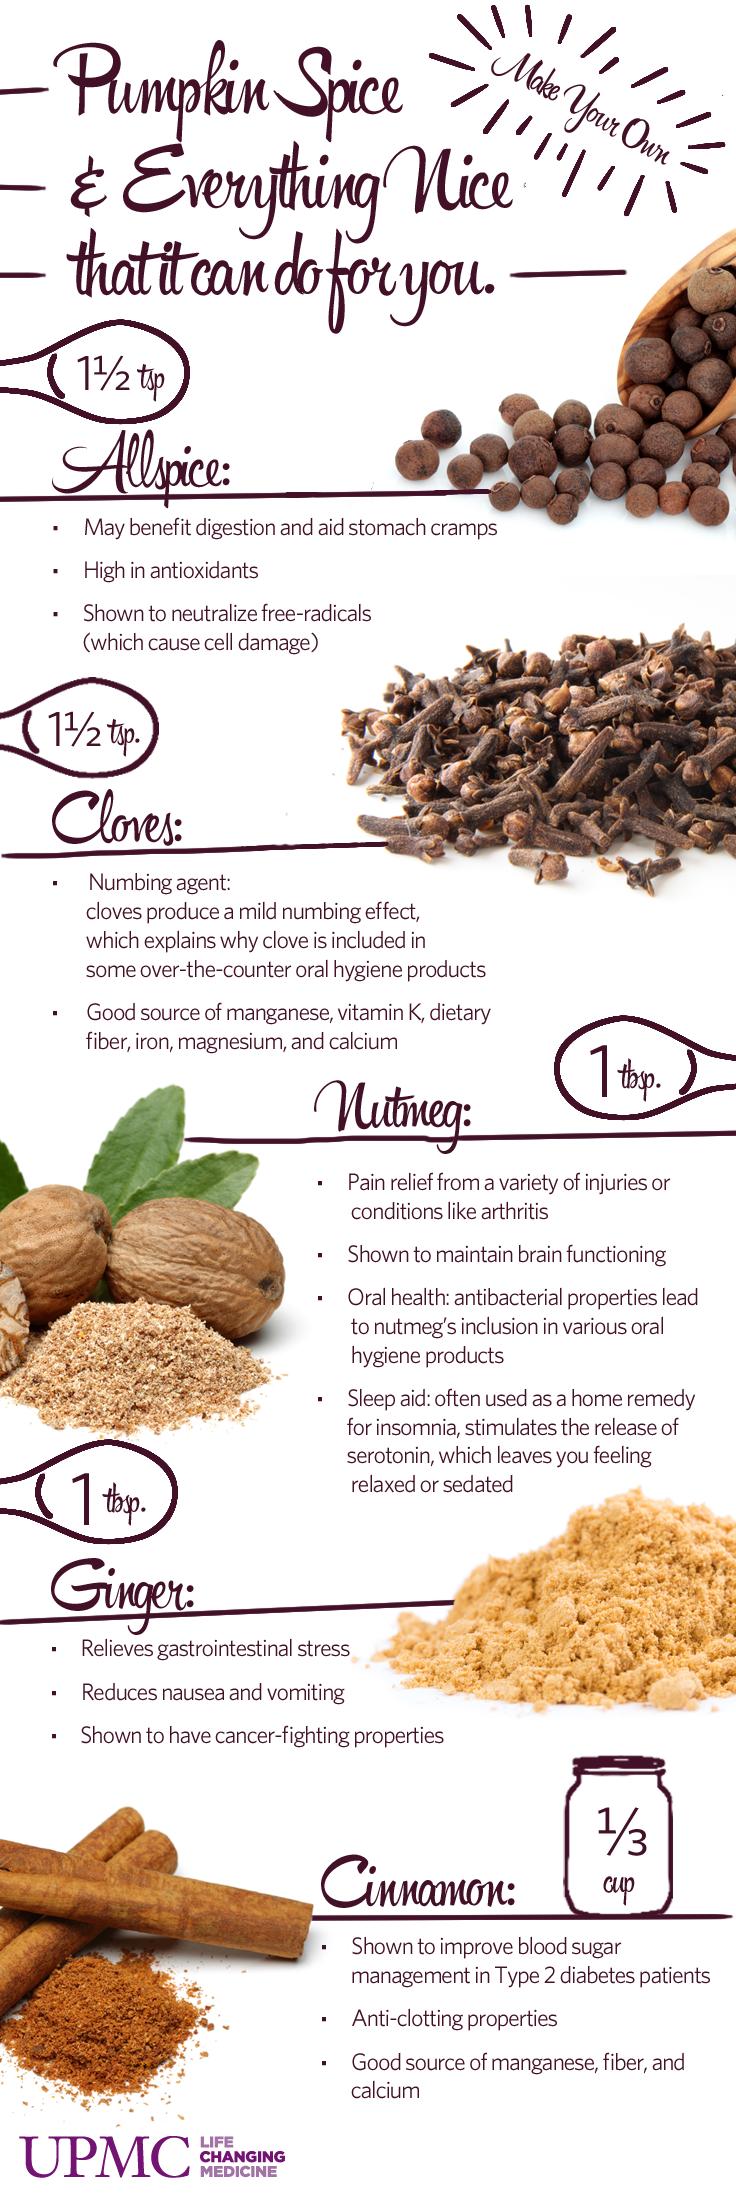 Medical benefits of Pumpkin Spice